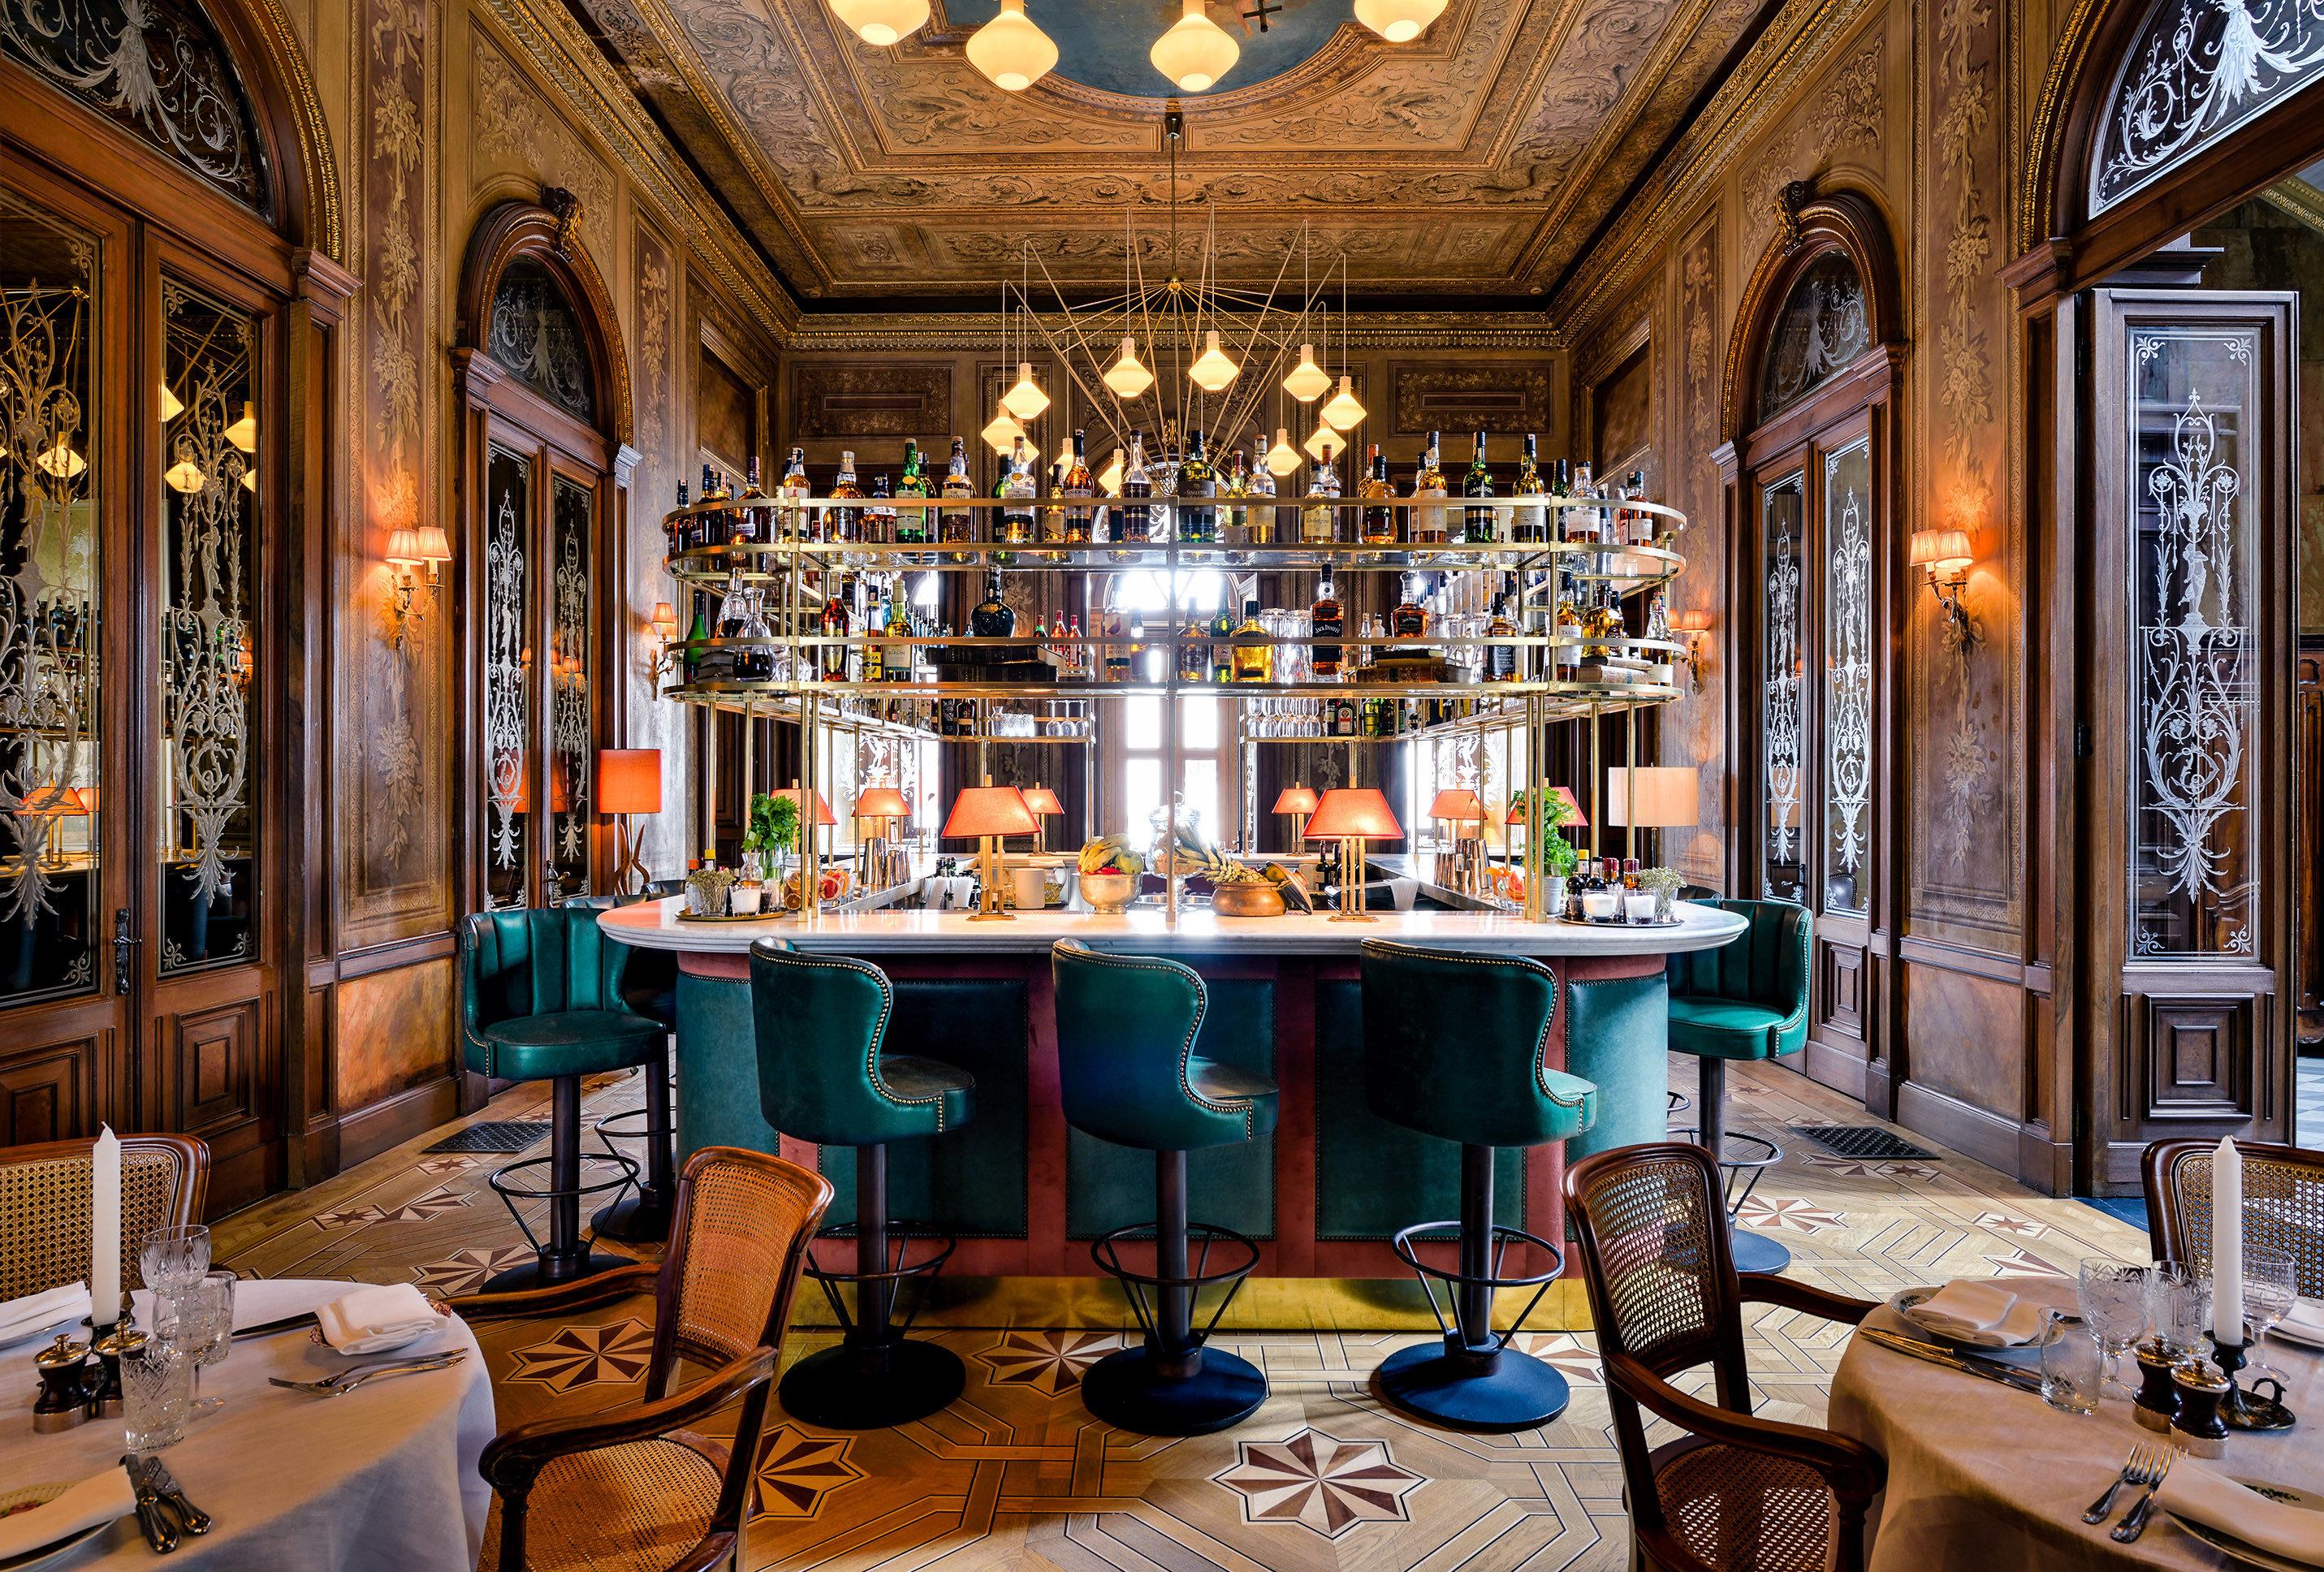 Boutique Hotels Hotels Luxury Travel indoor interior design restaurant dining room Bar set several